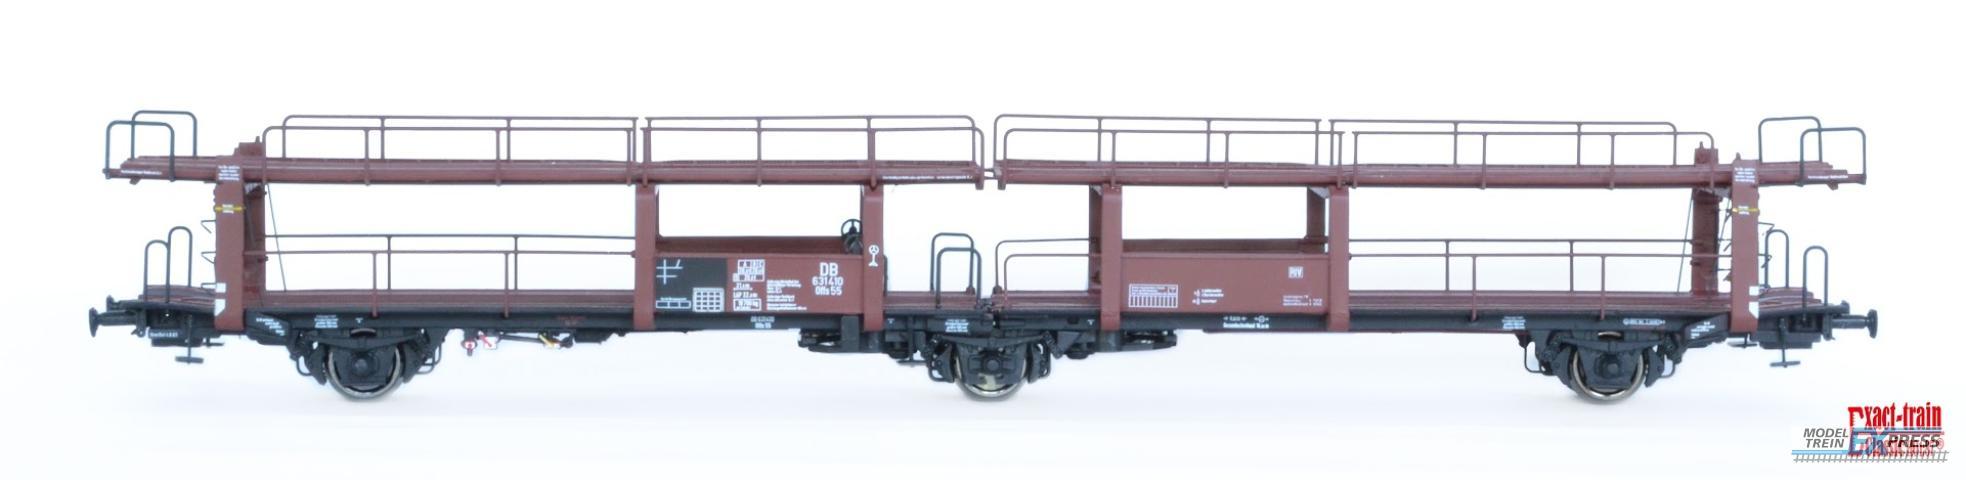 Exact-train 20026